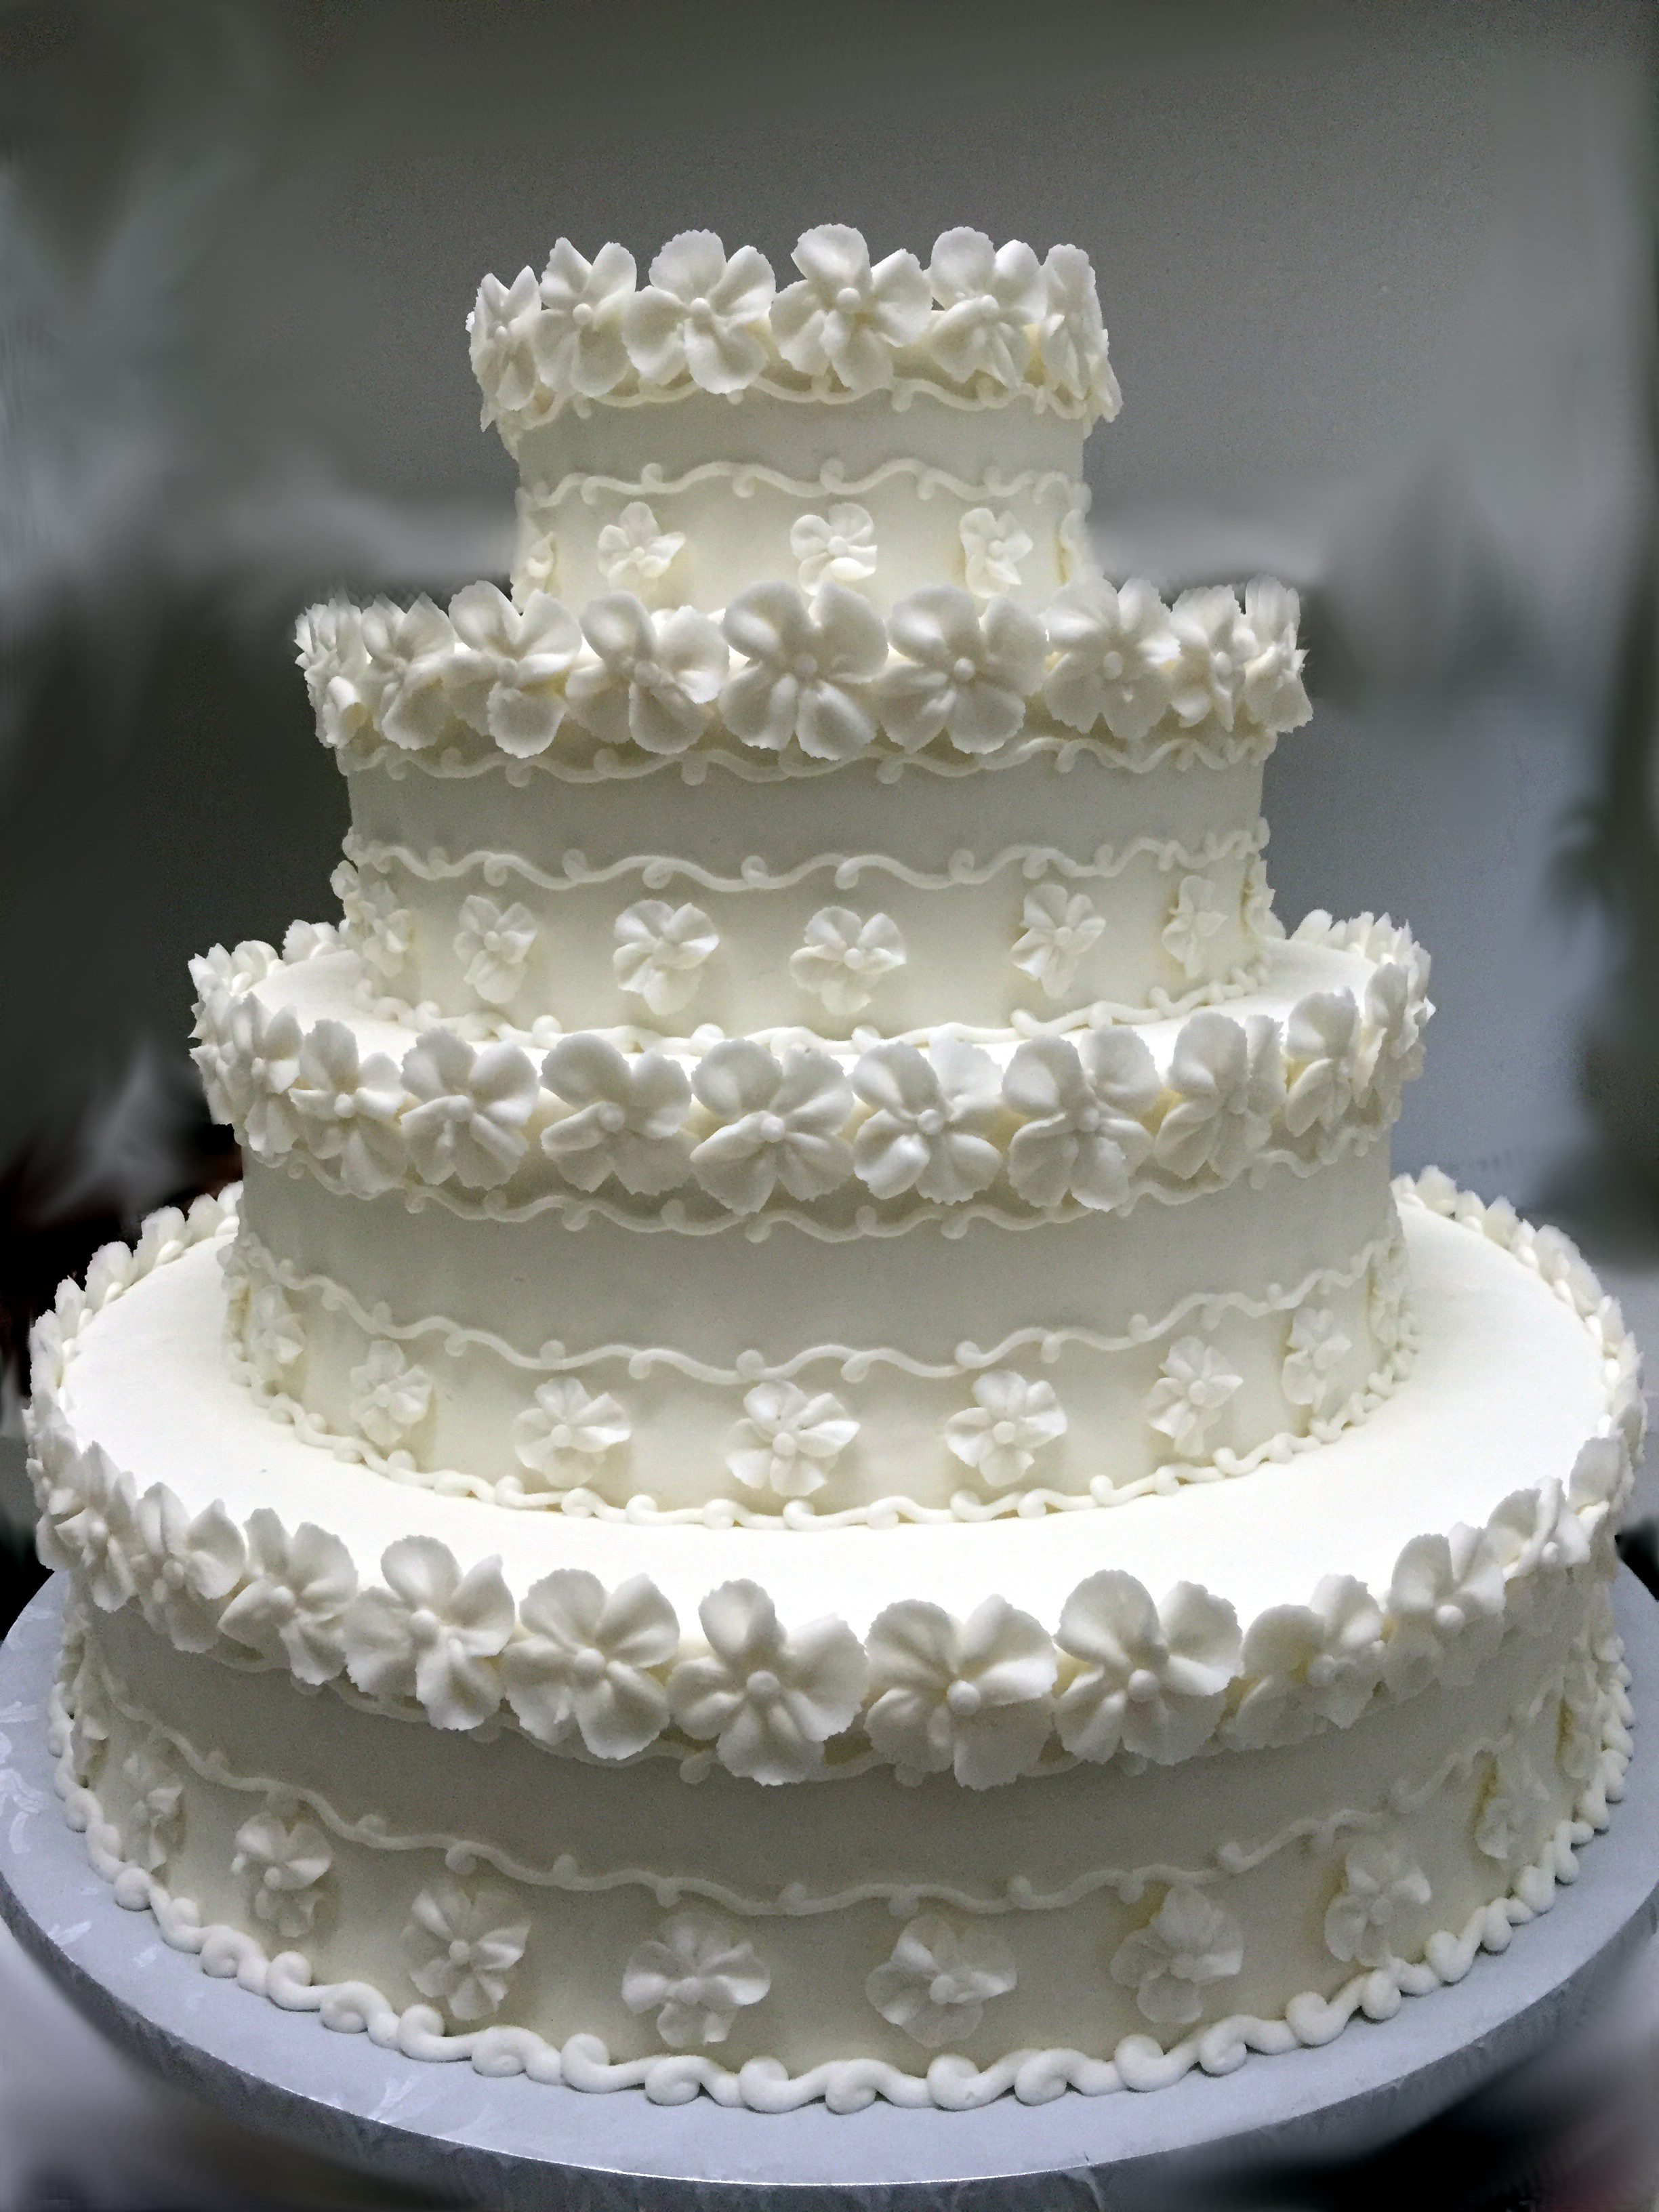 Holy Flowers! Cake